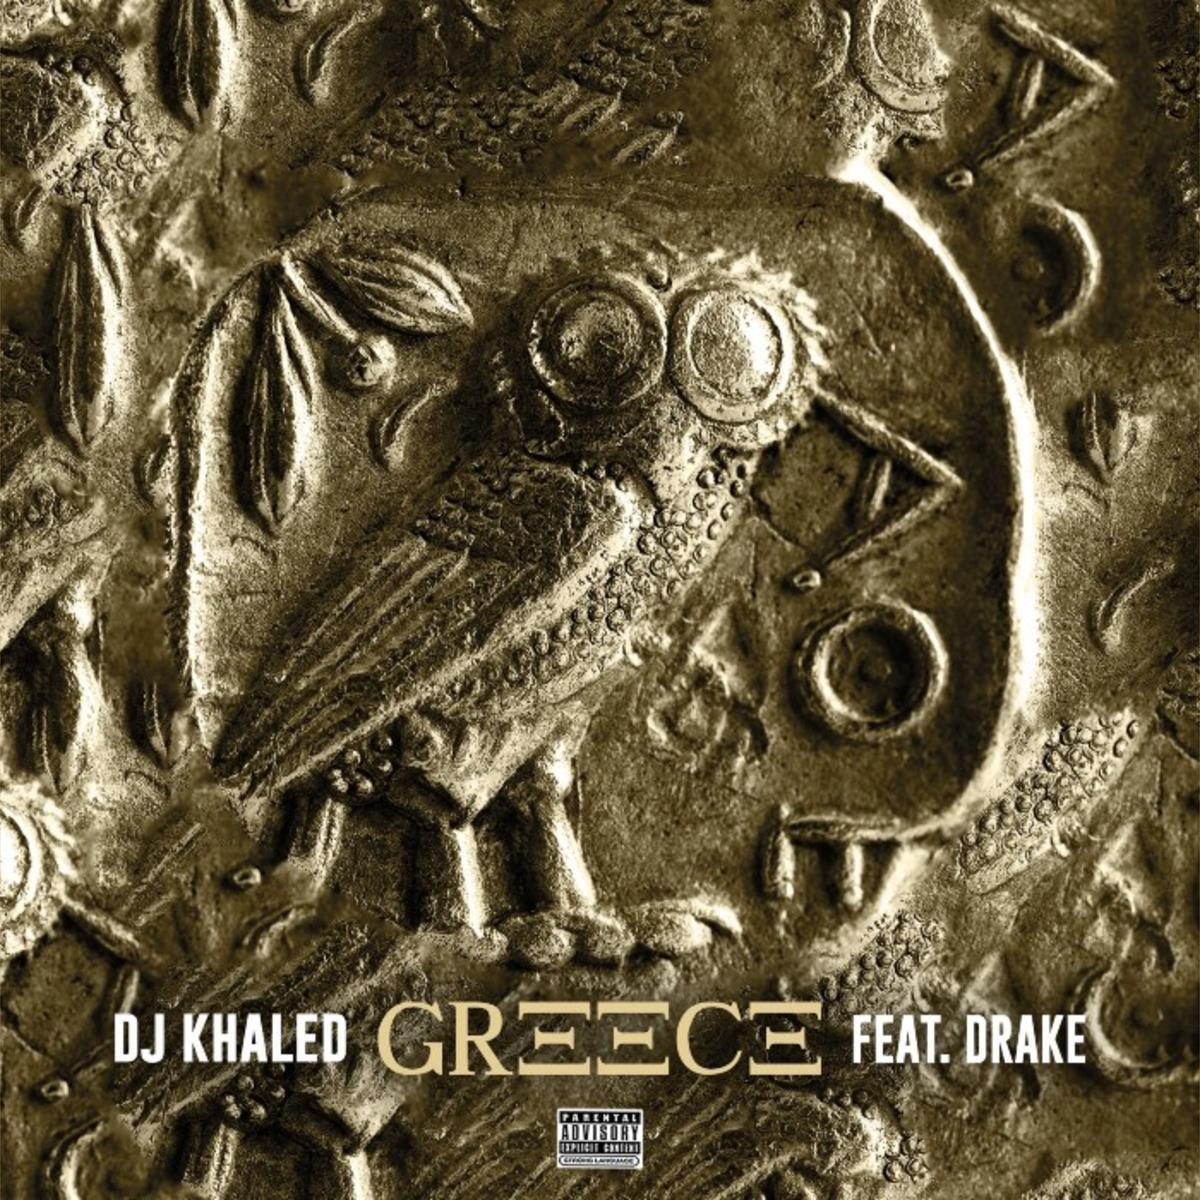 Dj Khaled Greece Ft Drake Audio Lyrics Visualizer Download Mp3 Music Foreign Songs Lyrics Music Video